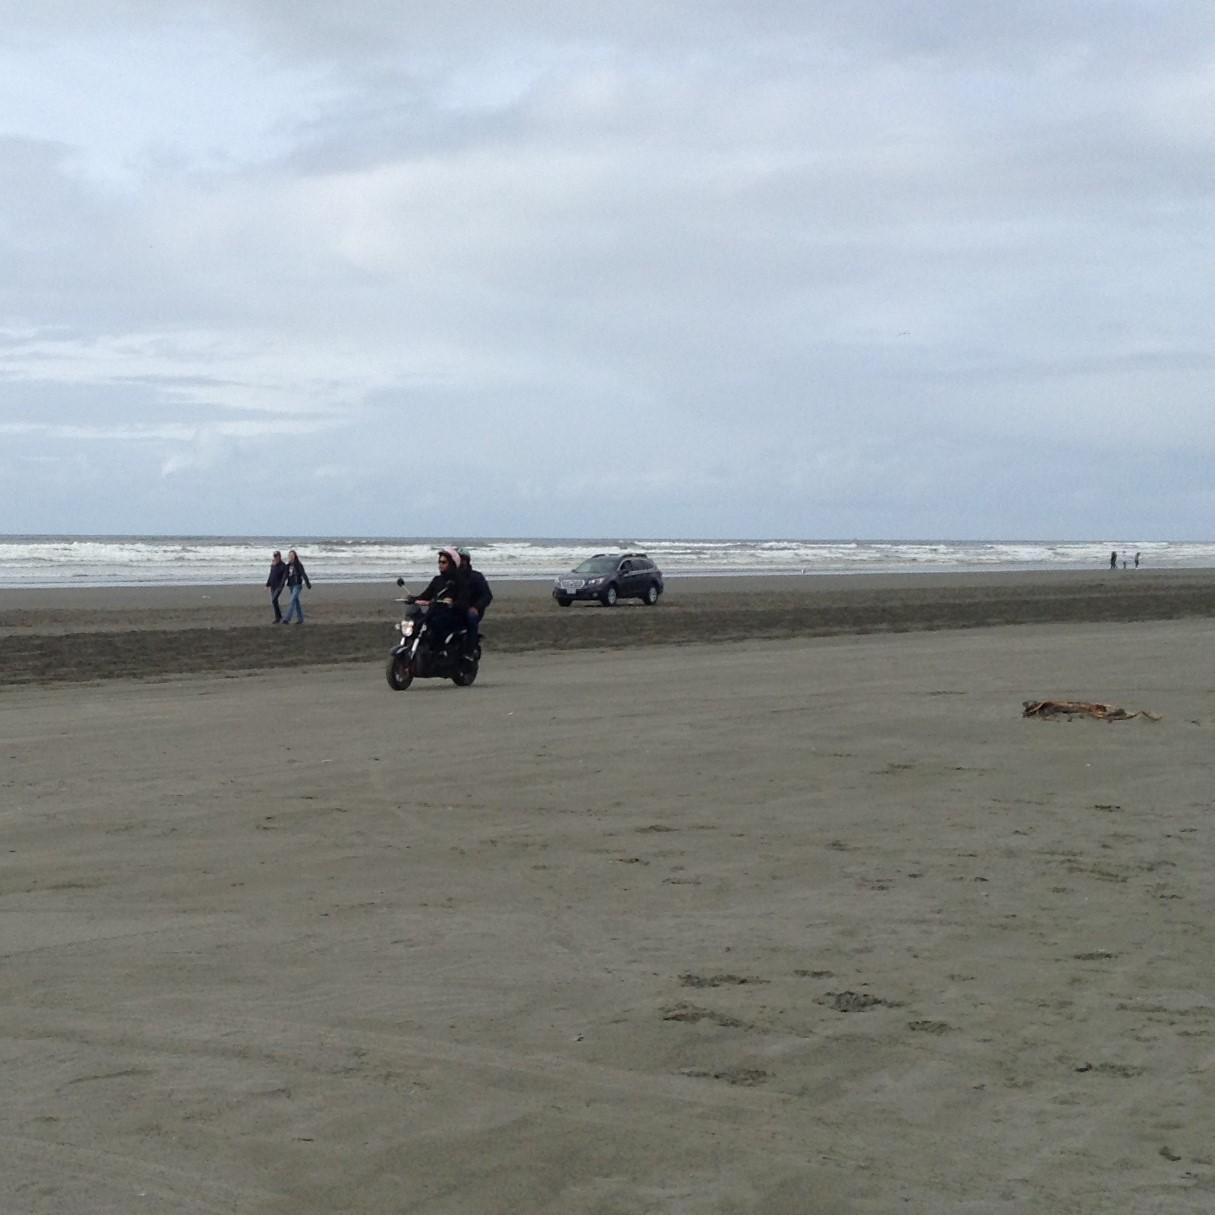 Beach life moped rentals on beach #graysharborbeaches